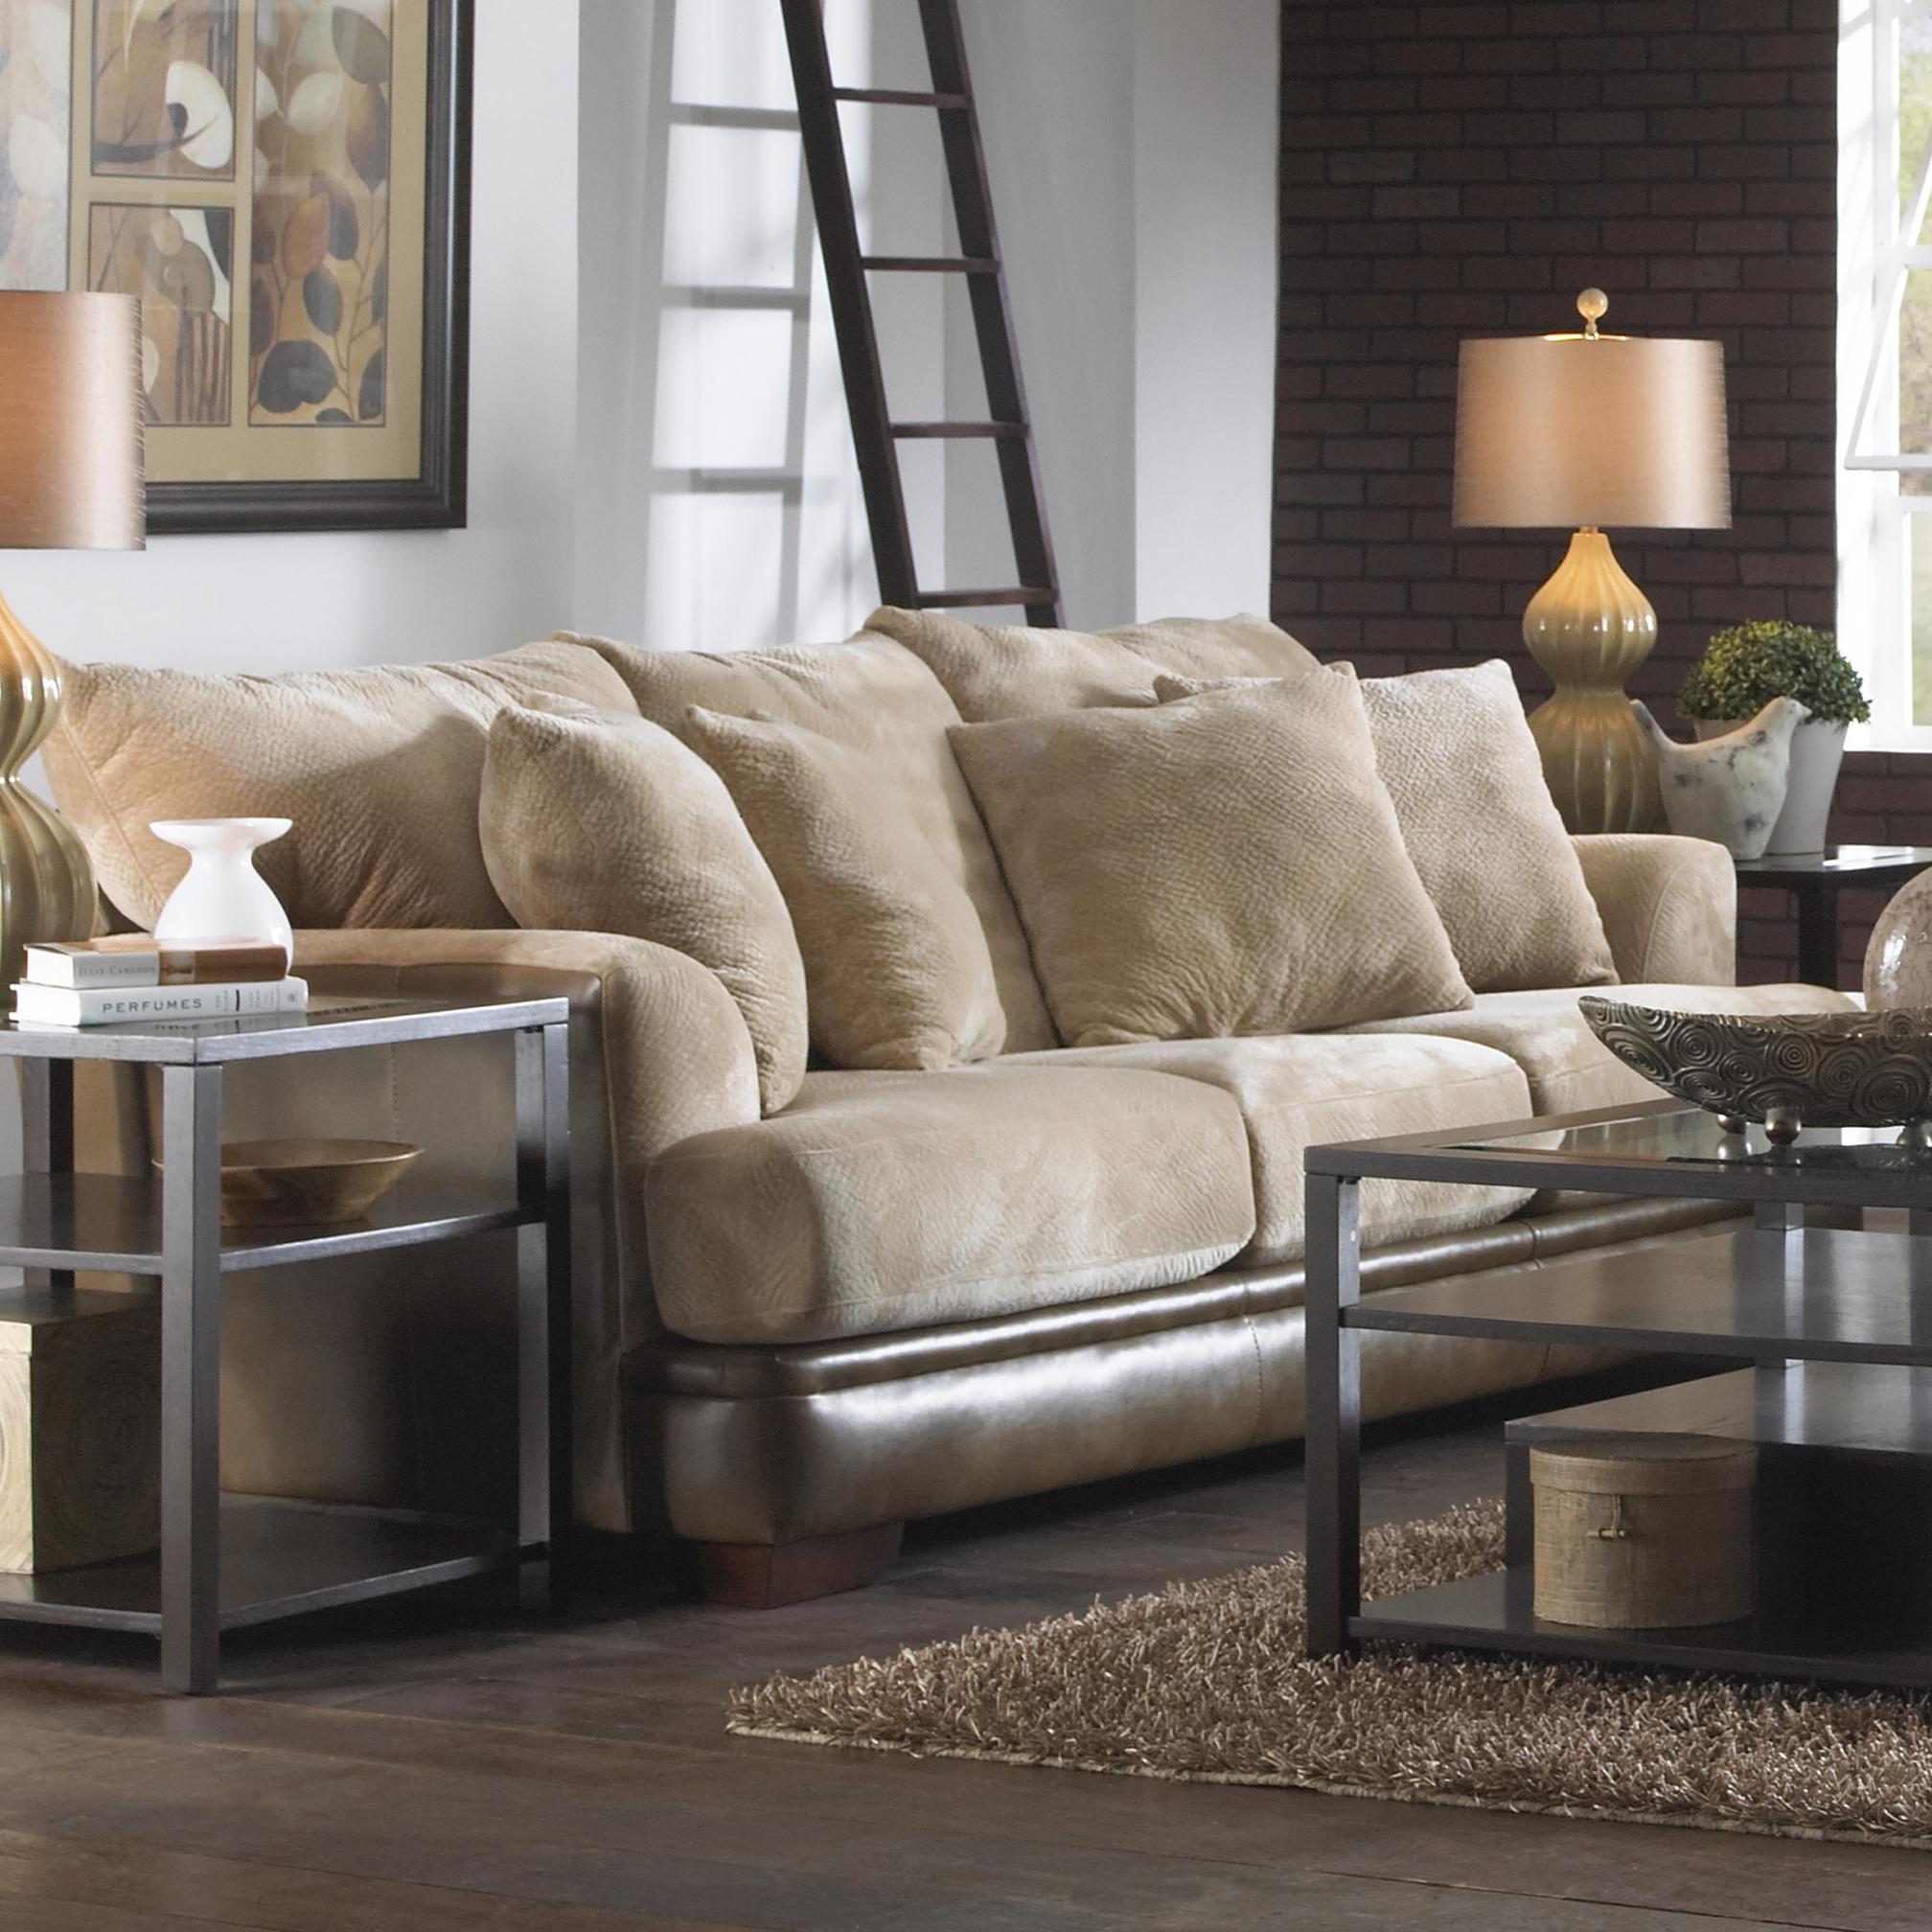 Unique Sofa: Contemporary Sofa With Unique Shark Fin Arms By Jackson